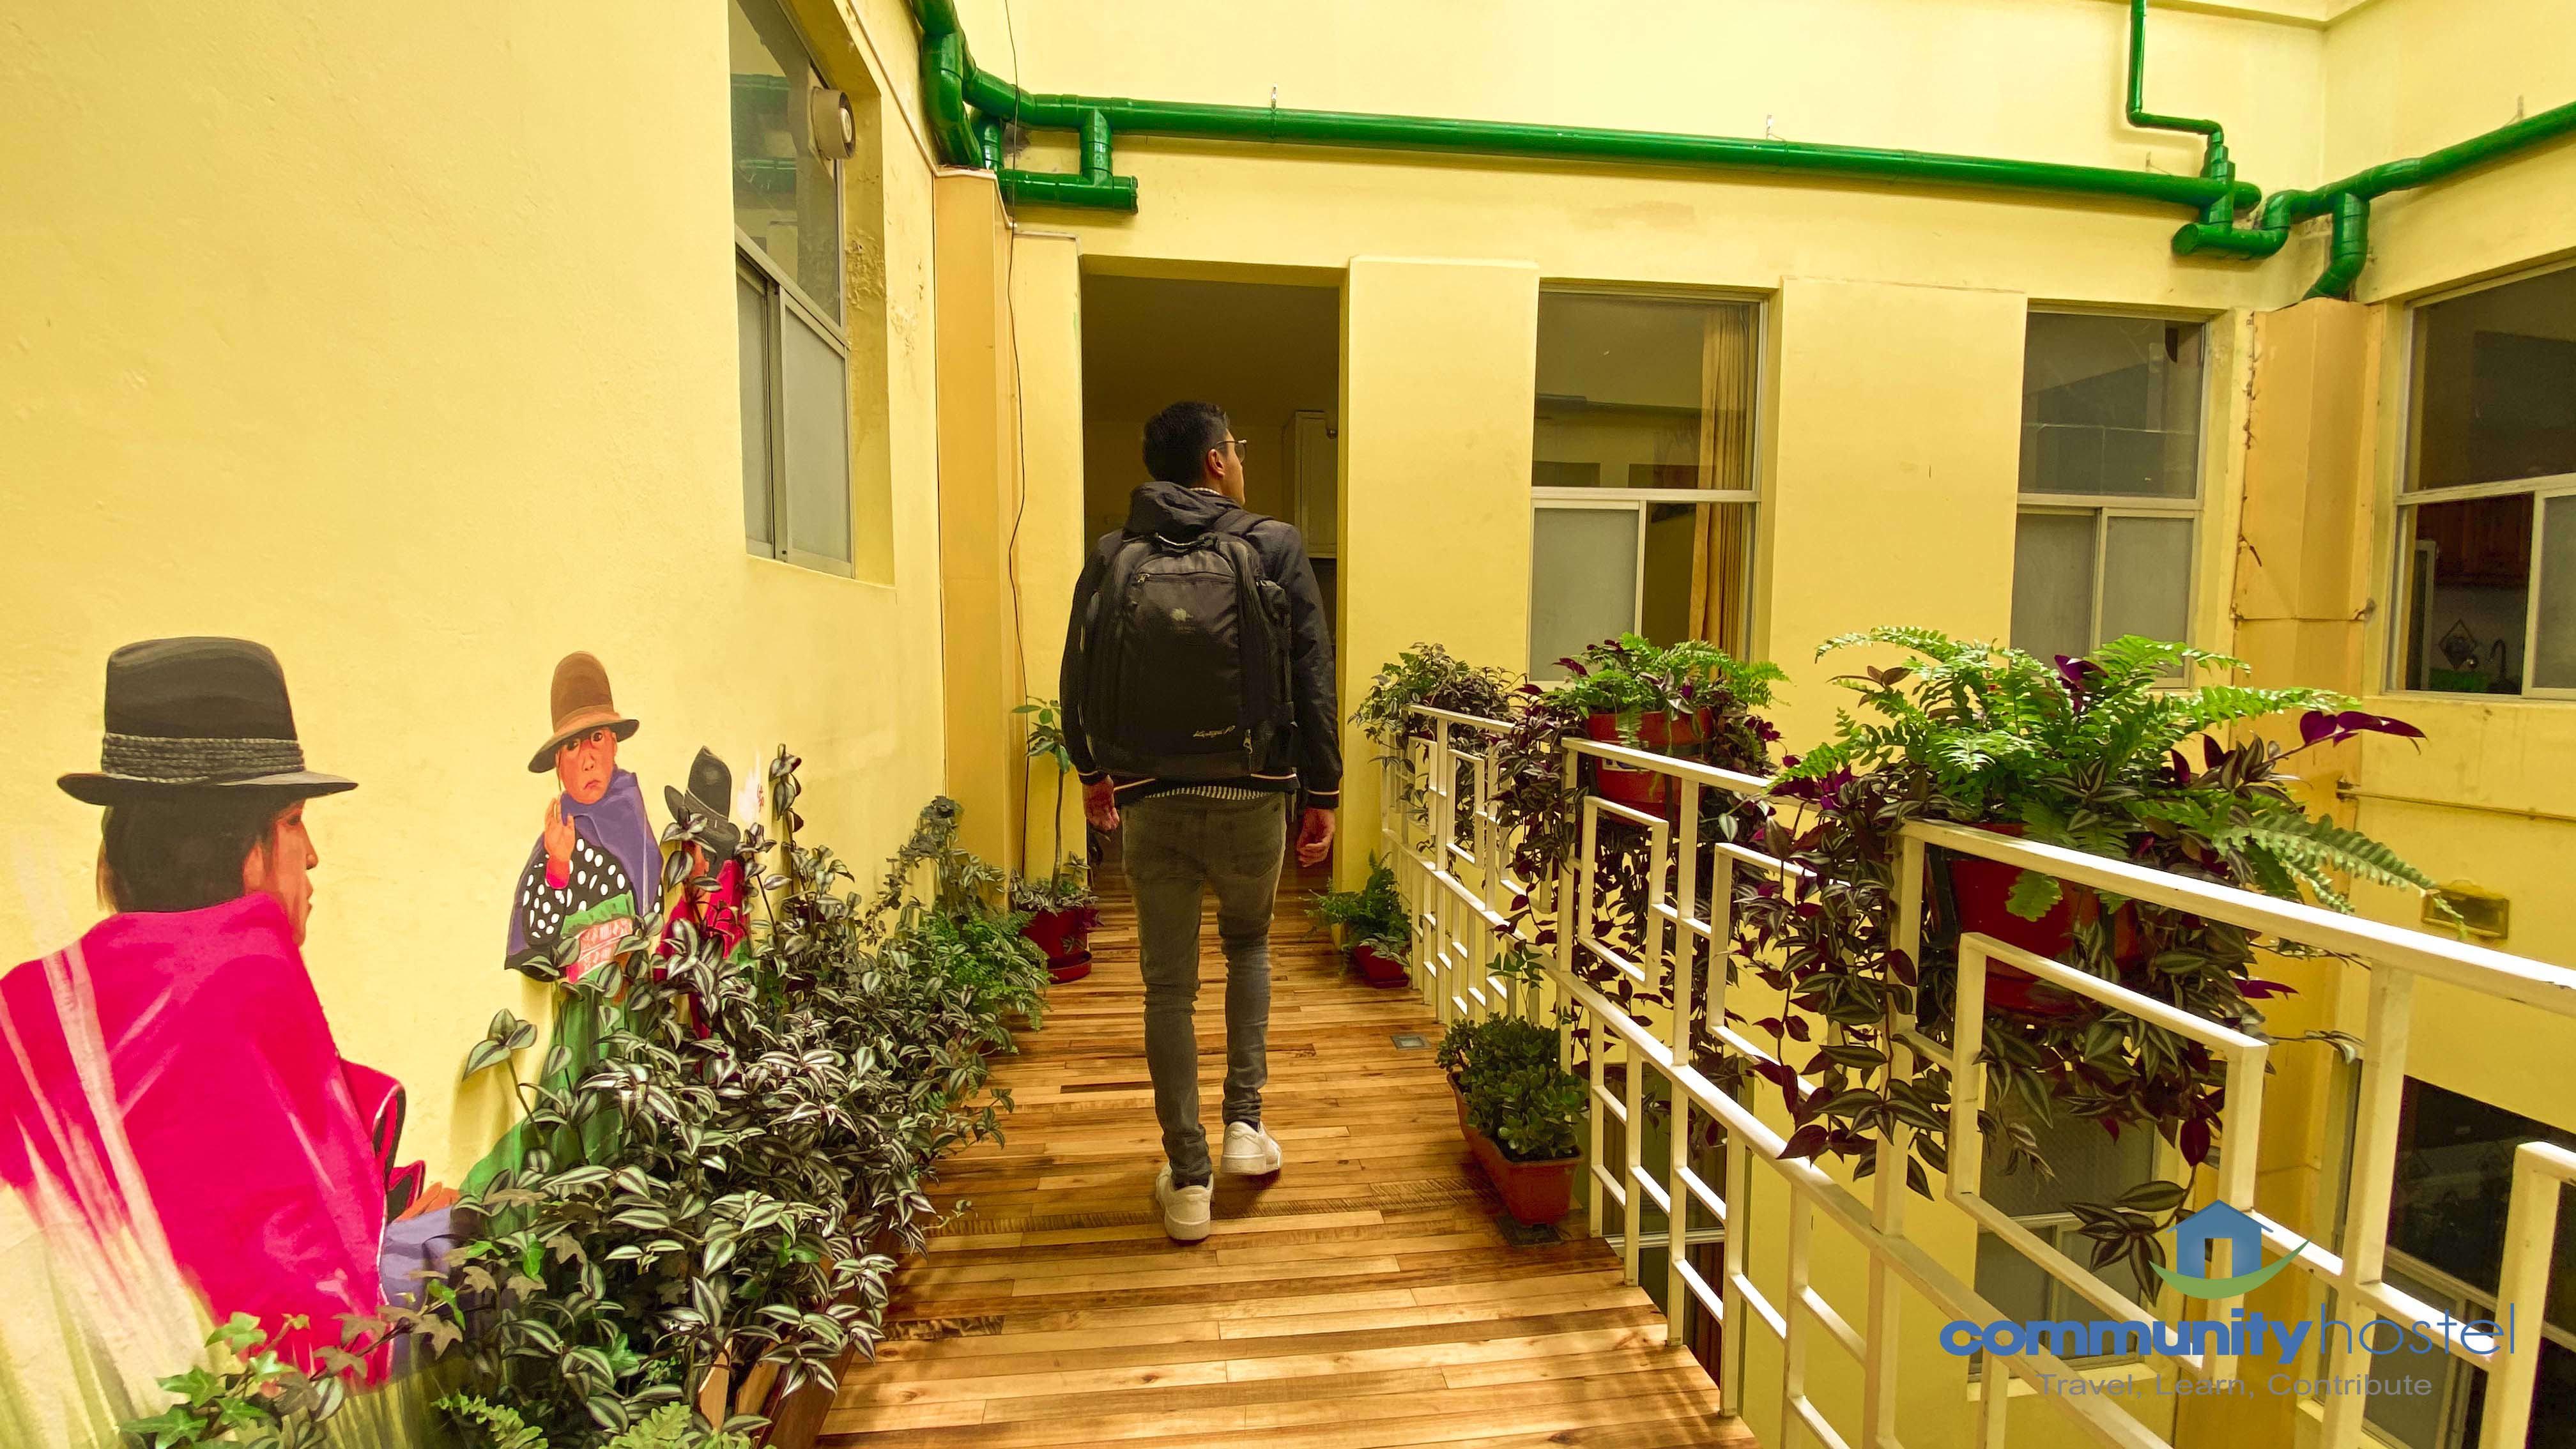 HOSTEL - Community Hostel